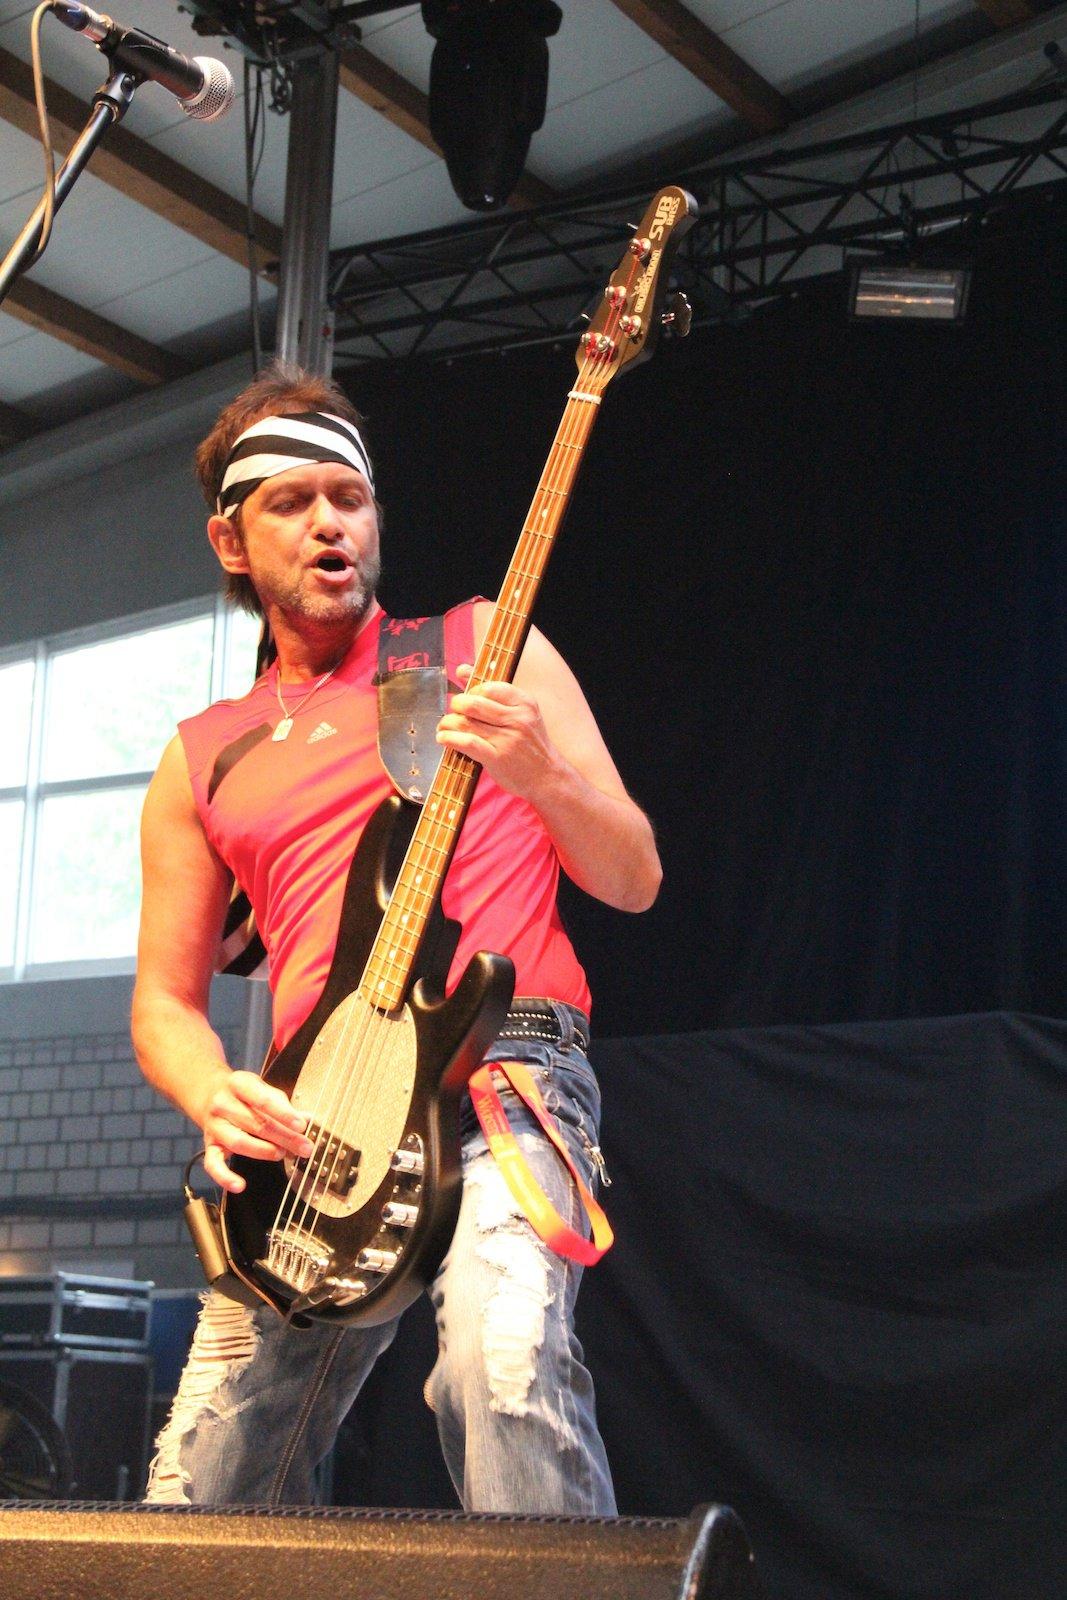 Stainless Quo - Sommerfesthalle, Otterstadt 18.06.2011 - 20